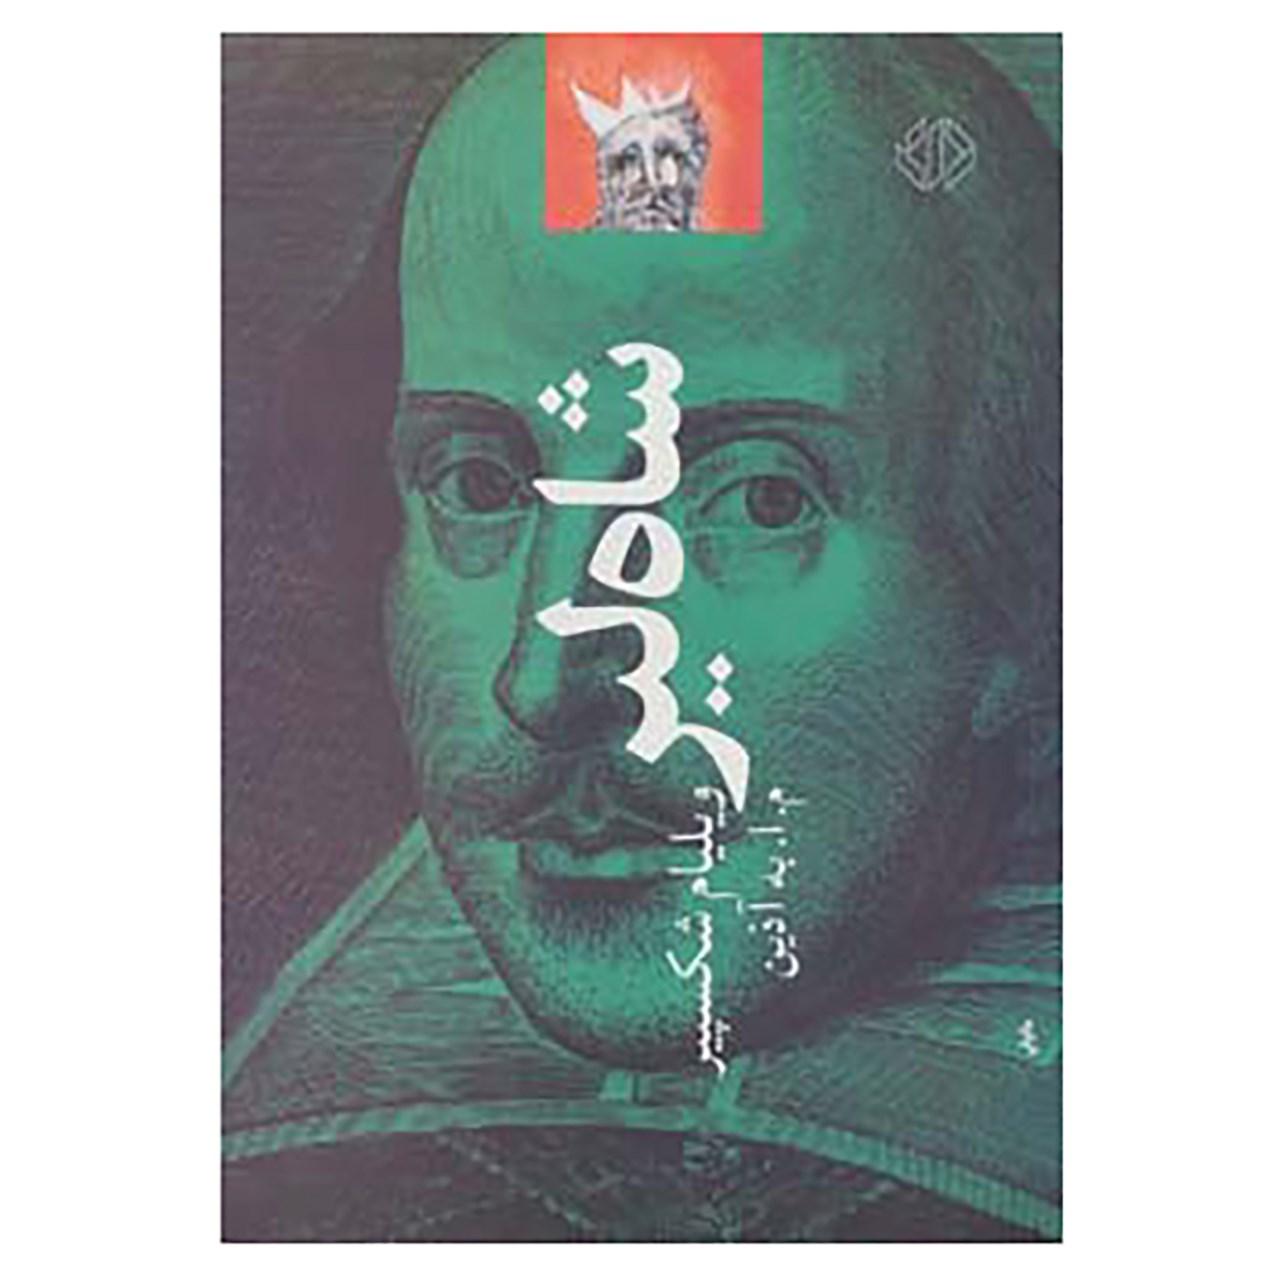 خرید                      کتاب شاه لیر اثر ویلیام شکسپیر